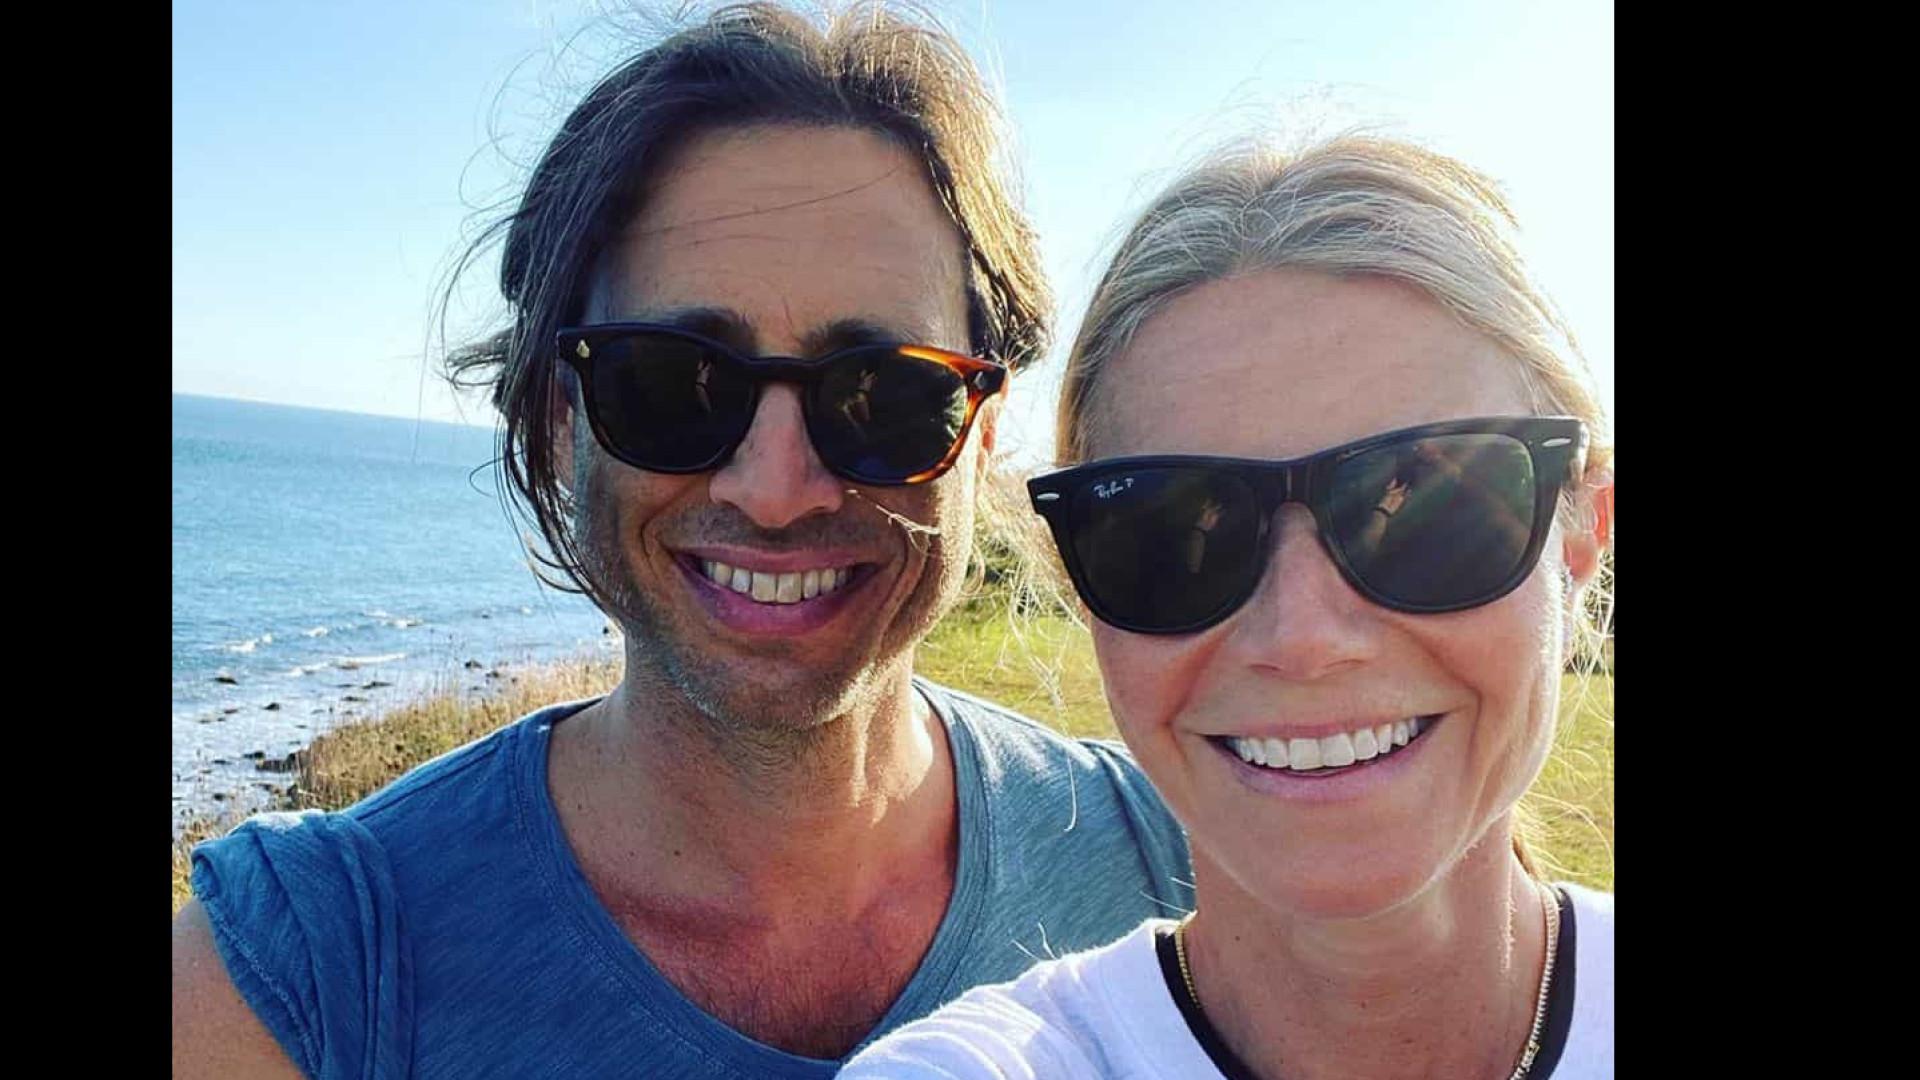 Gwyneth brinca que morar com o marido vai destruir sua vida sexual